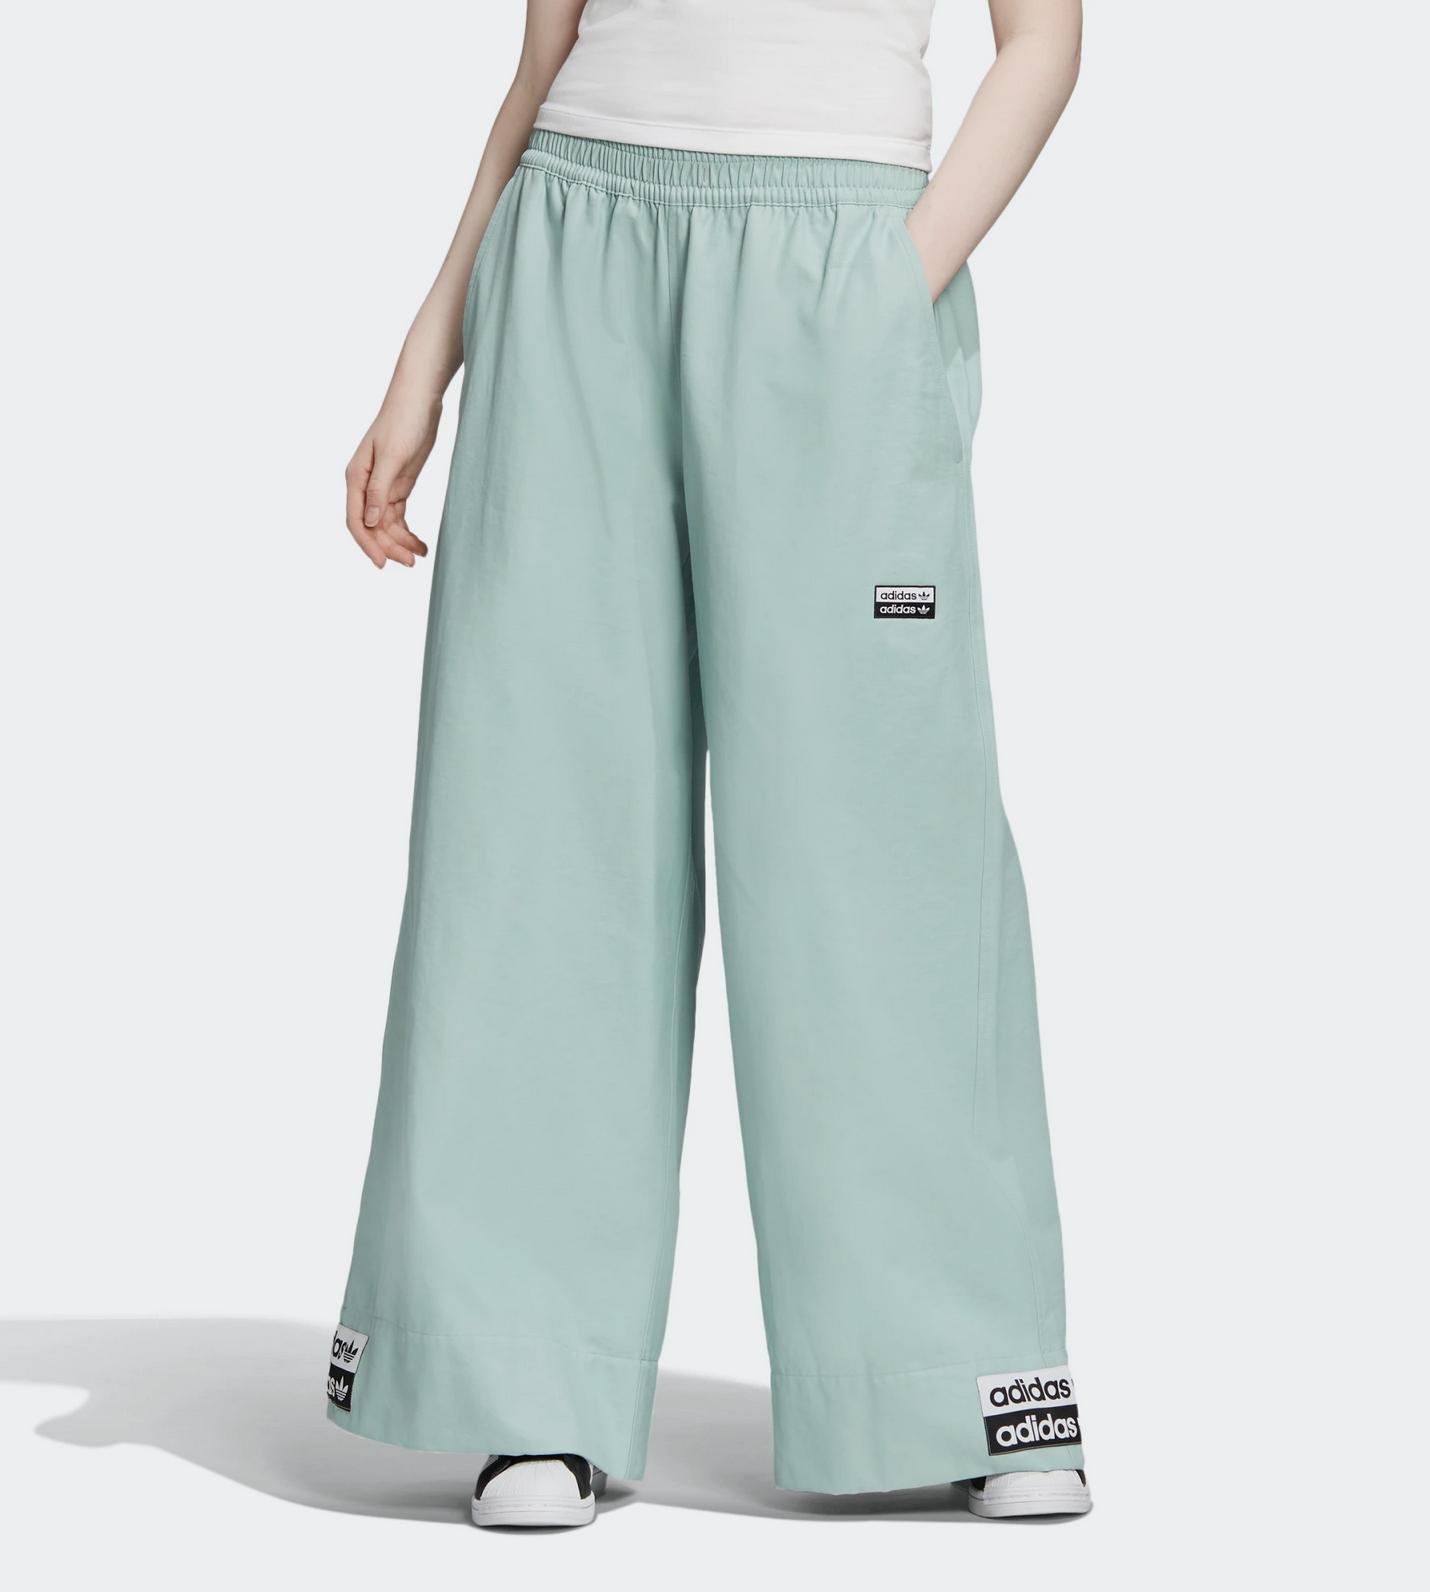 Pantalón Originals